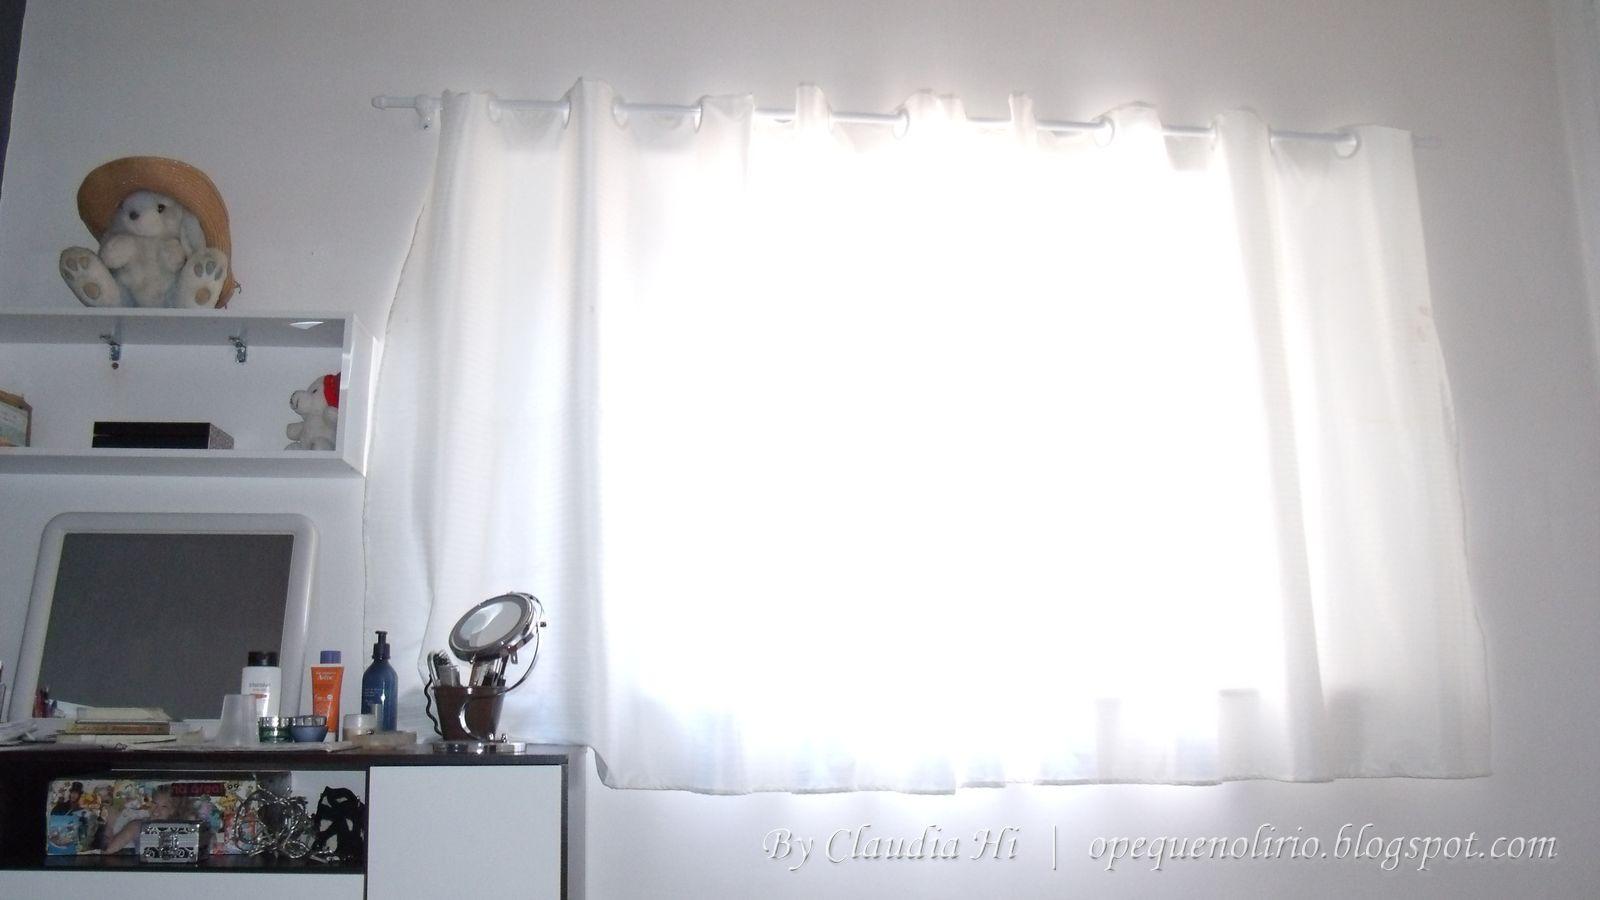 passo a passo diy room curtain cortina de quarto branco #6B483B 1600x900